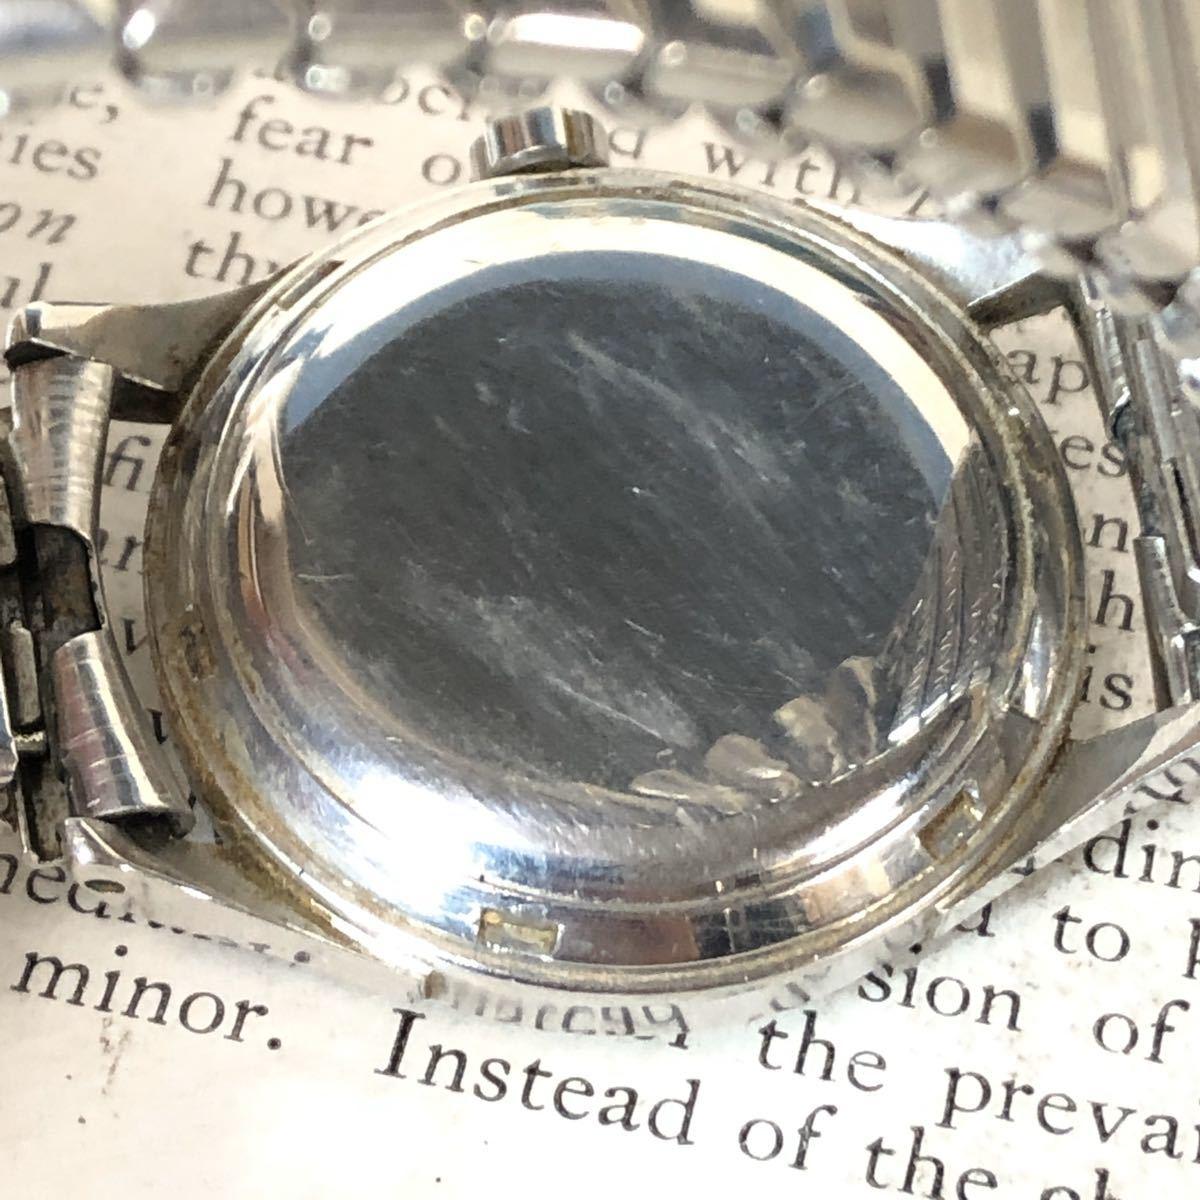 OMEGA オメガ 腕時計 機械式 自動巻 ハーフロータリー SWISS MADE スイス SS 3針 ビンテージ 希少 値下げ交渉あり 稼動品 W1519_画像8